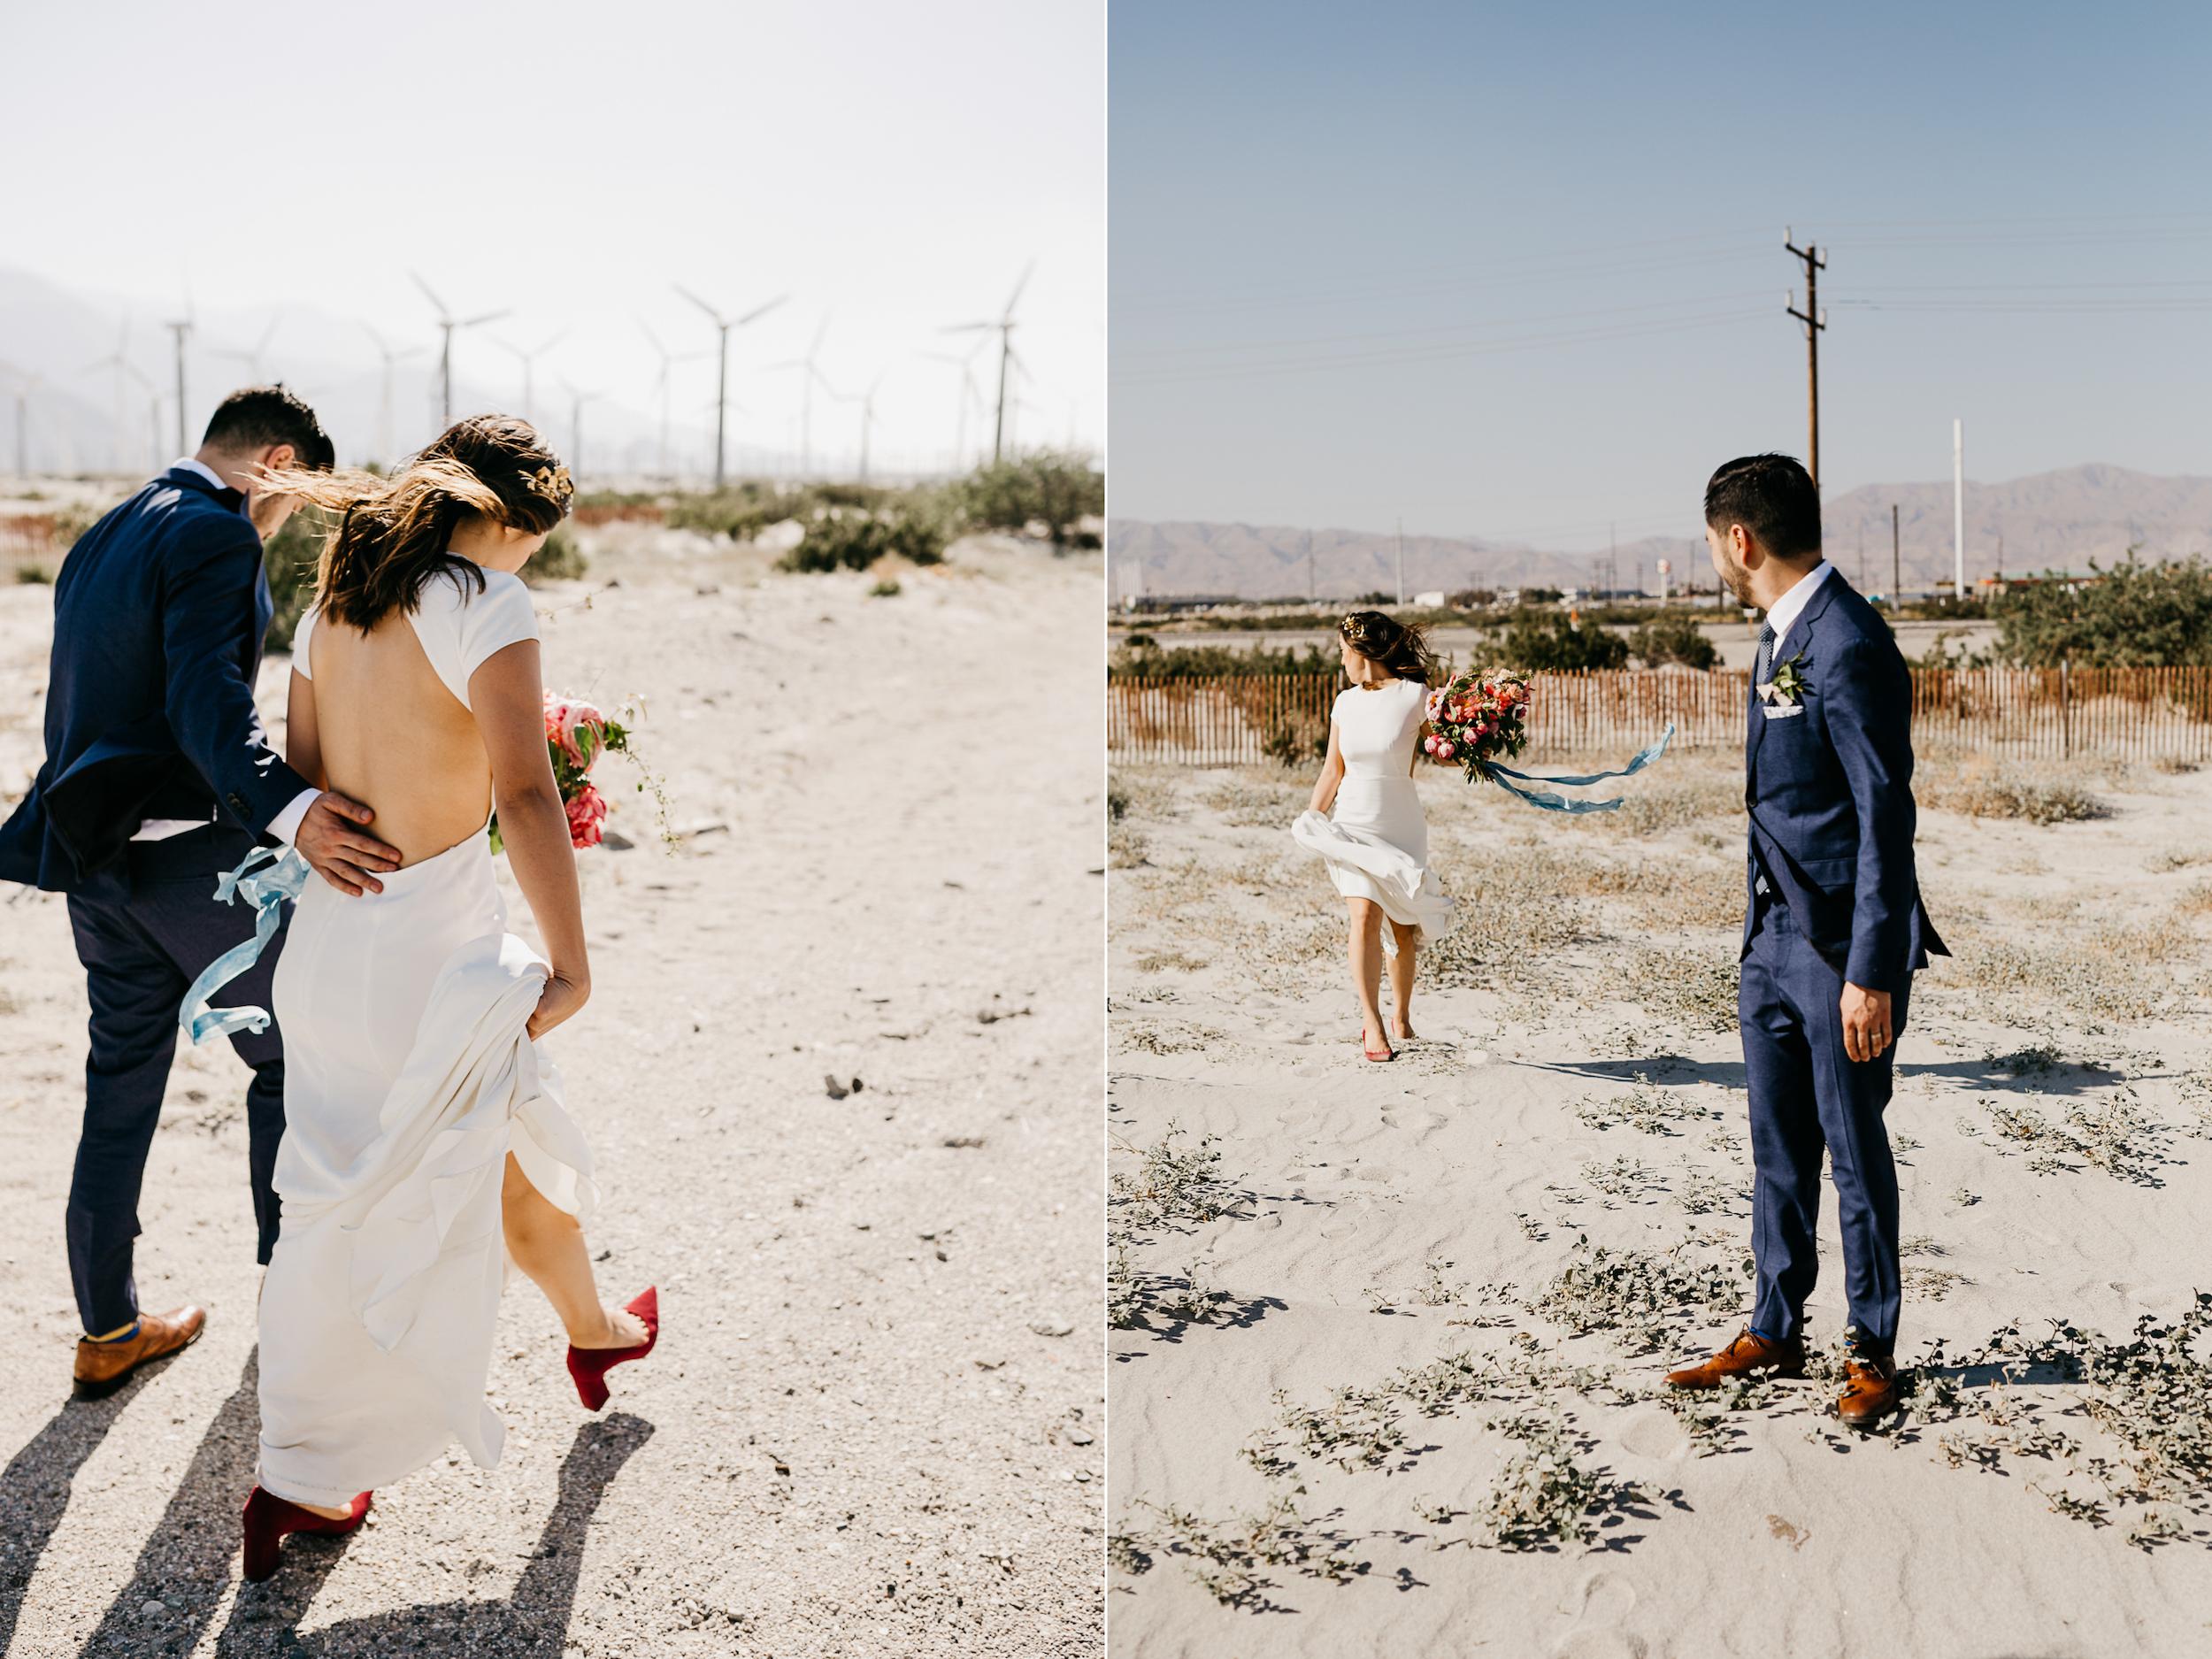 palm-springs-wedding-photographer 029.jpg